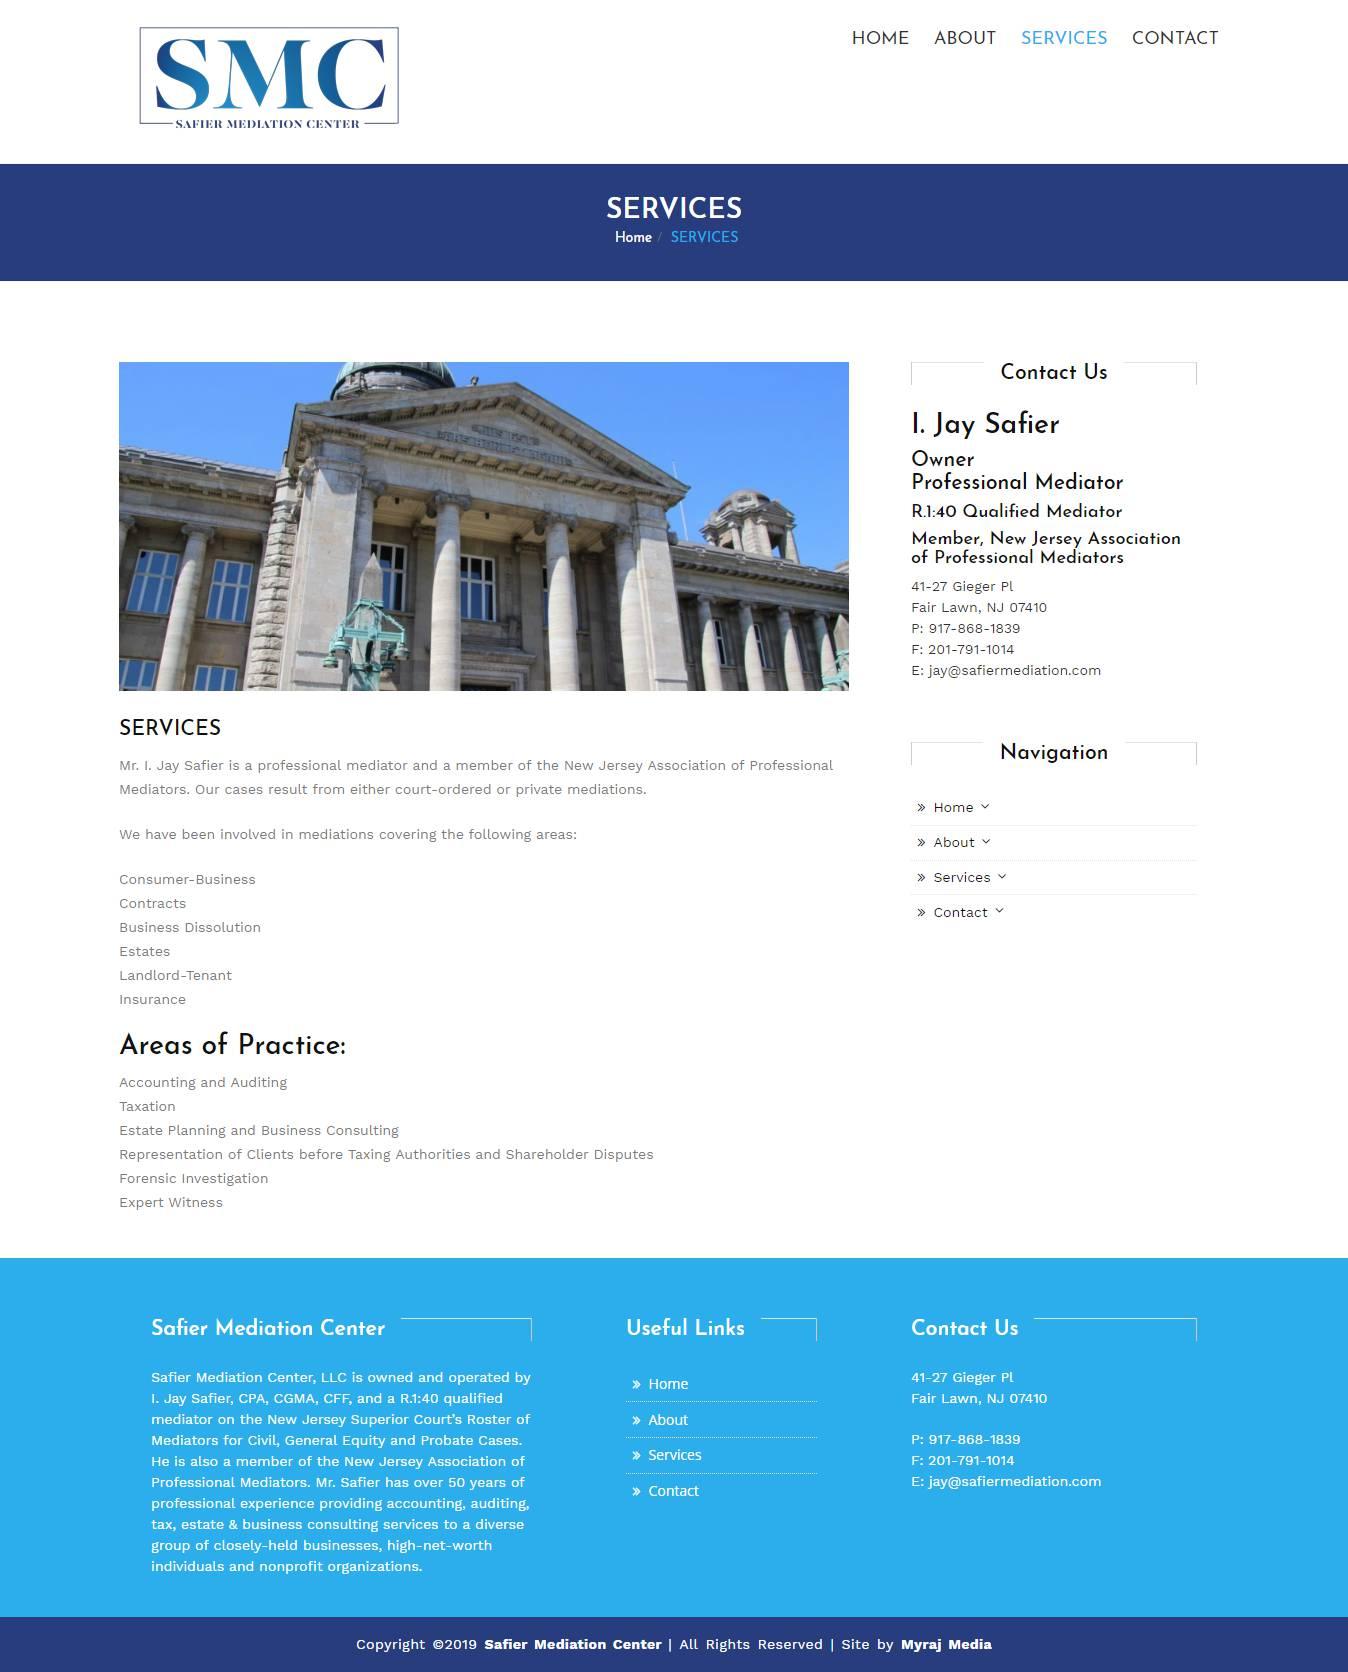 Safier Mediation Center